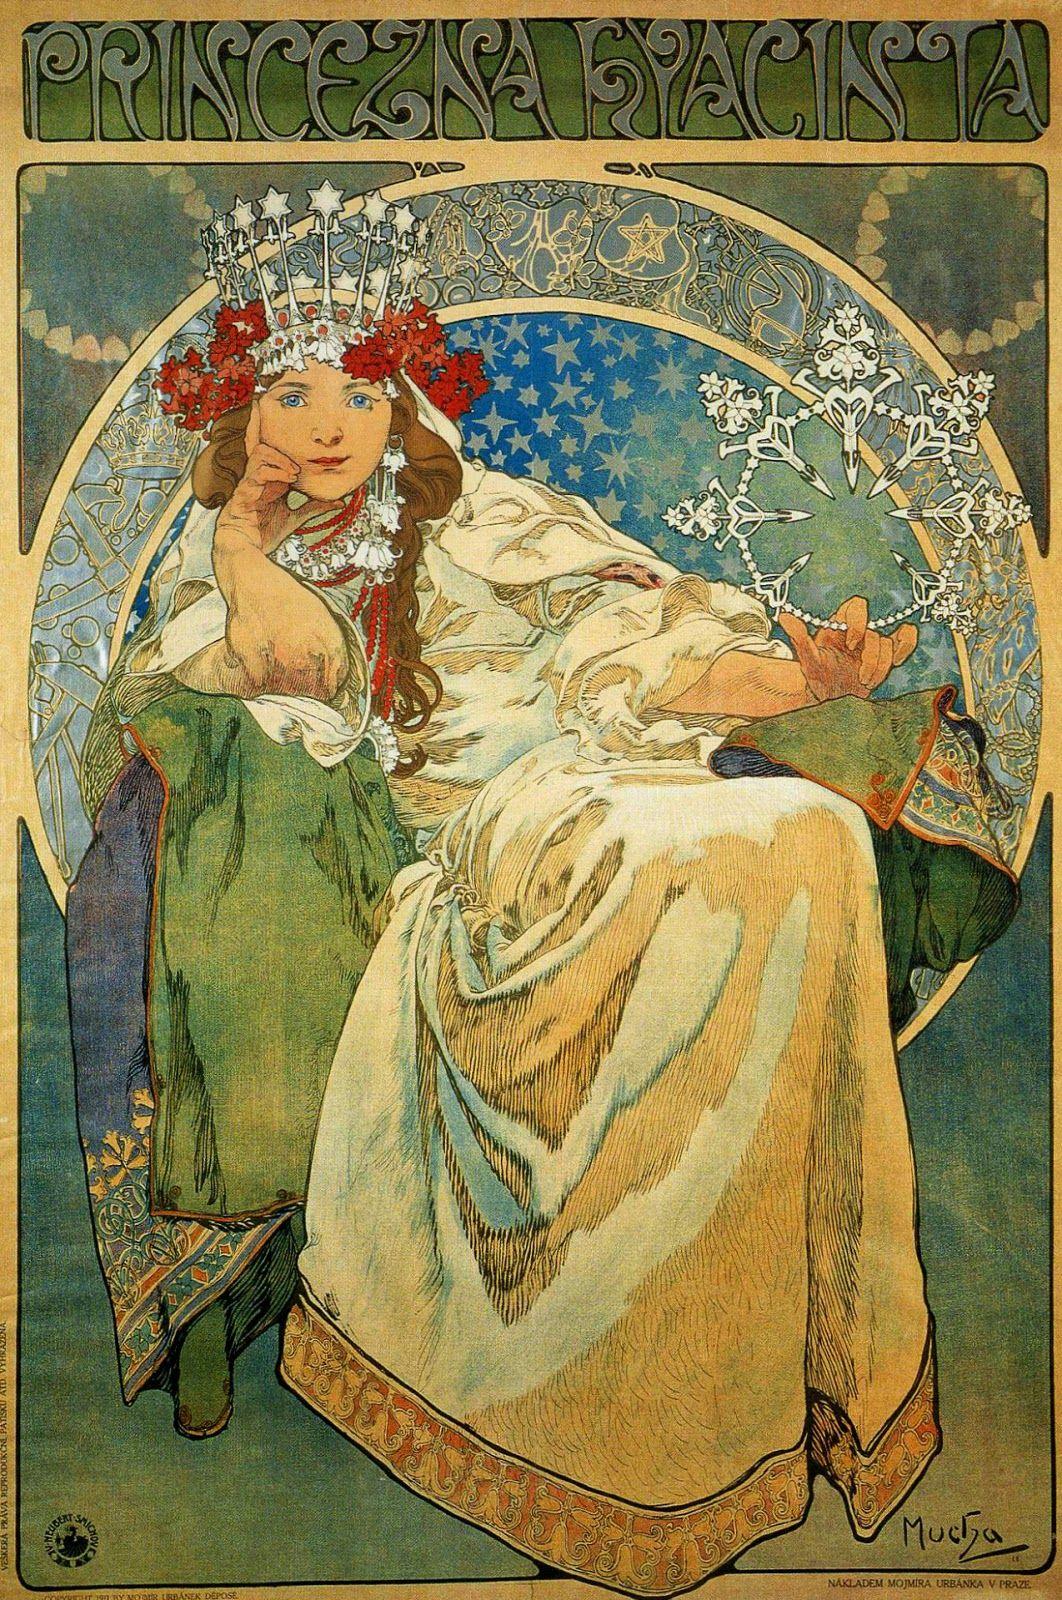 Art in Space: Alphonse Mucha: Princess Hyacinth (1911)